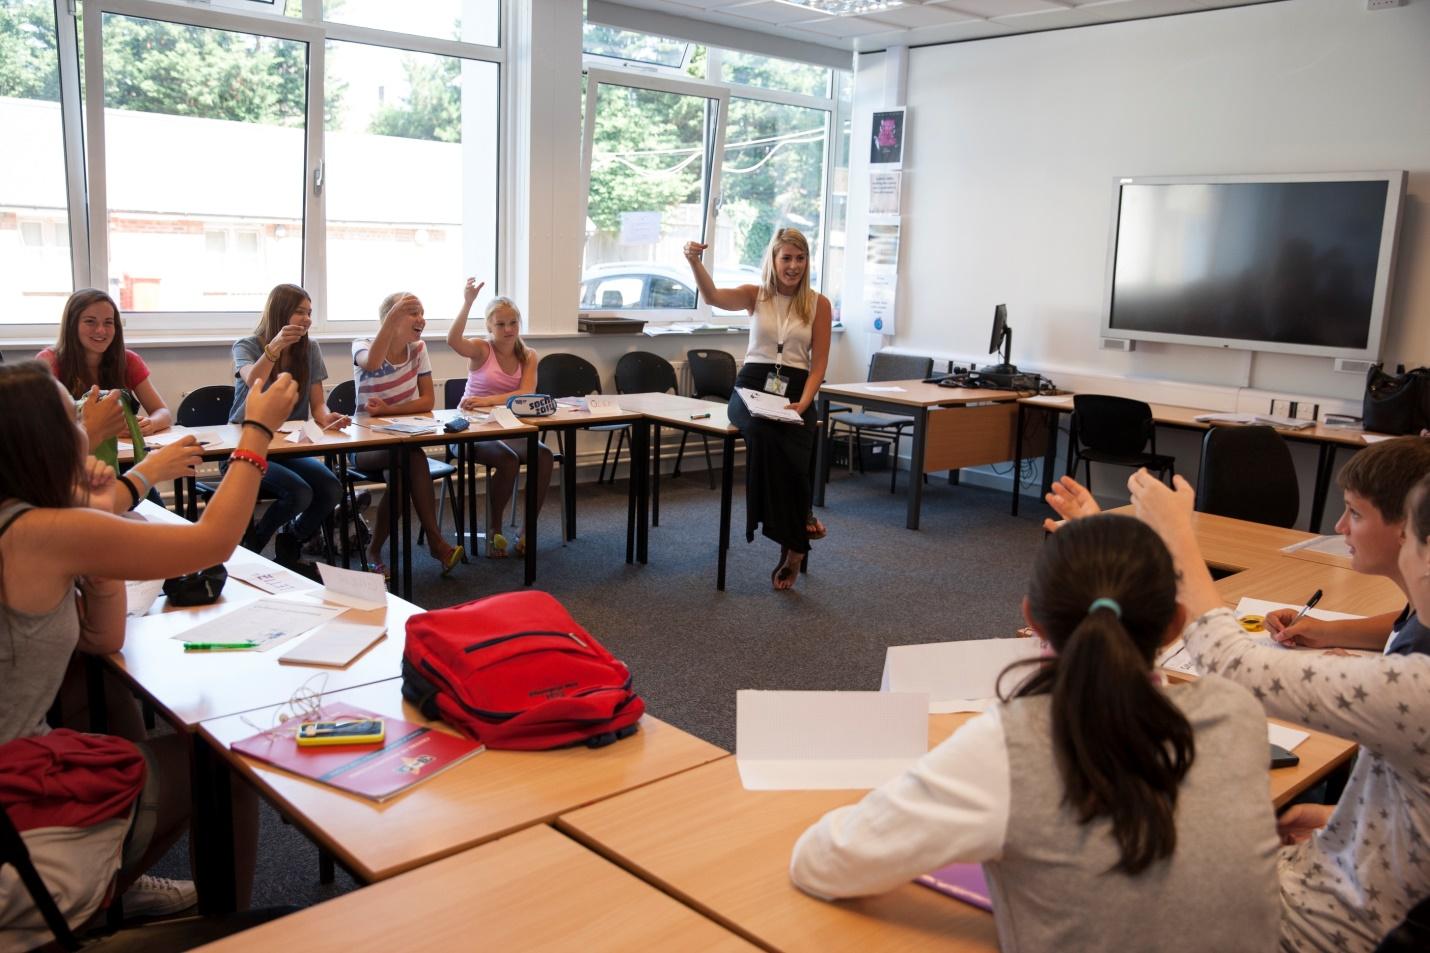 CES - Centre of English Studies / Worthing | JuniorCourses.com